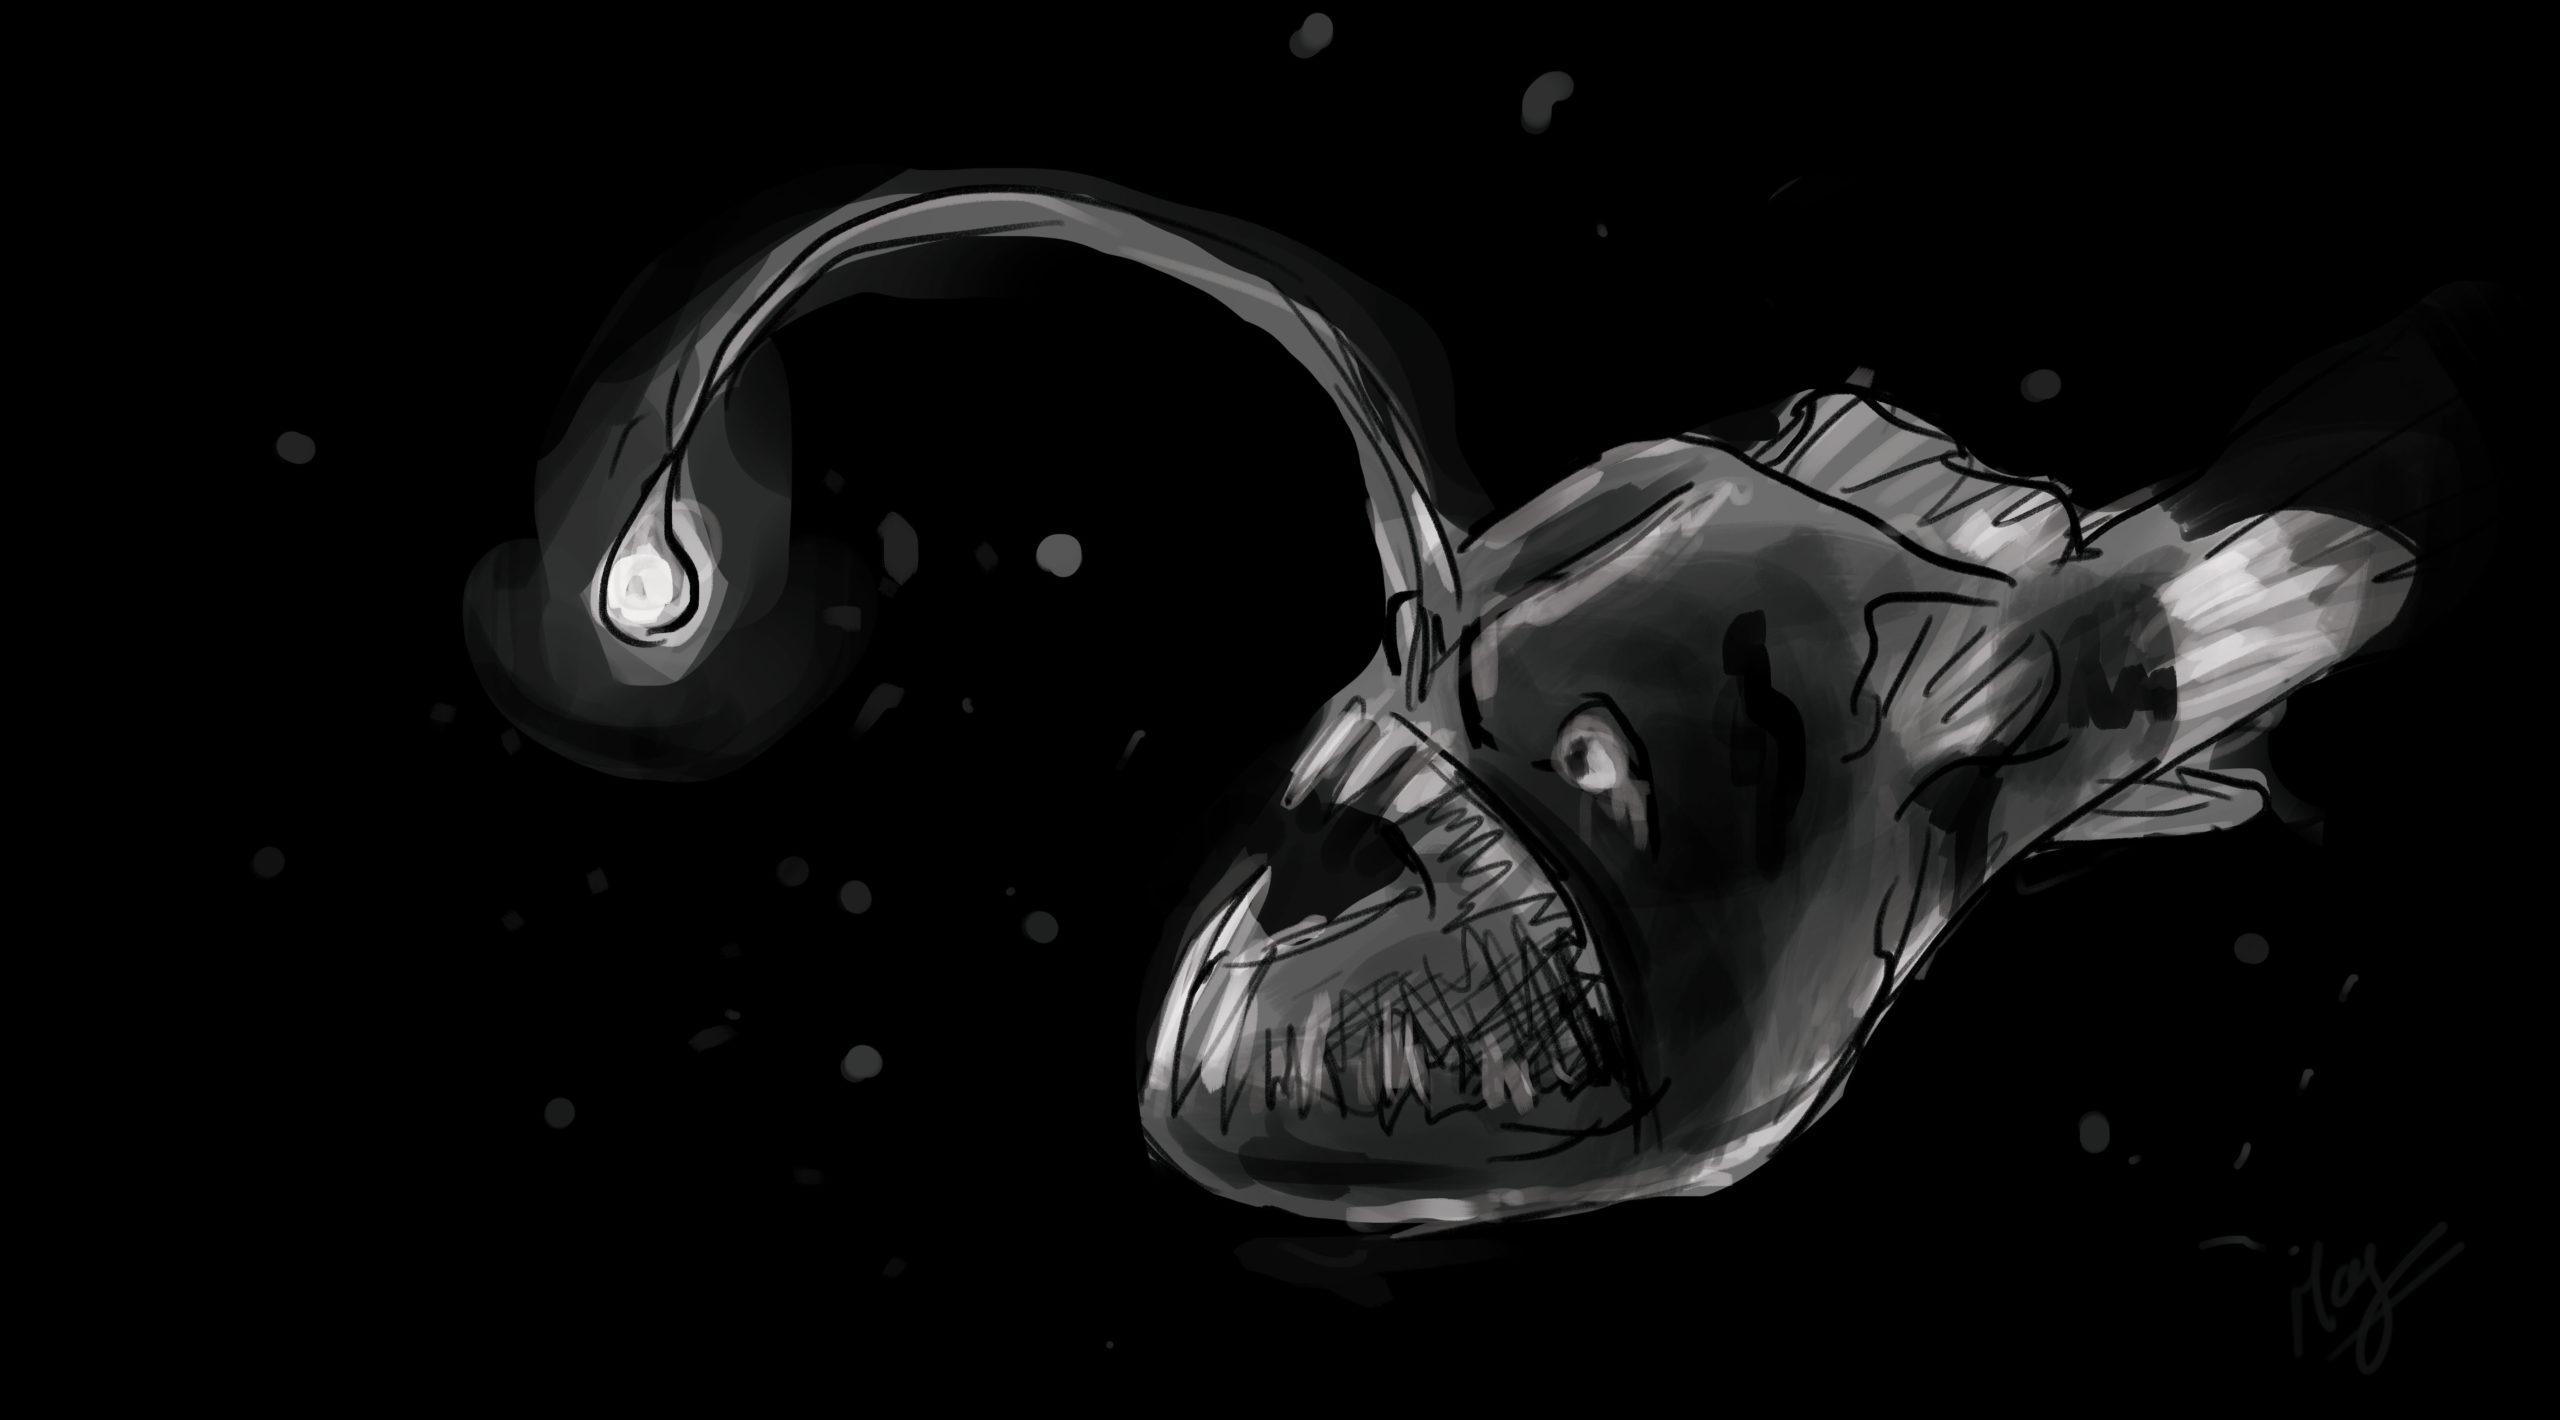 Lanternfish study